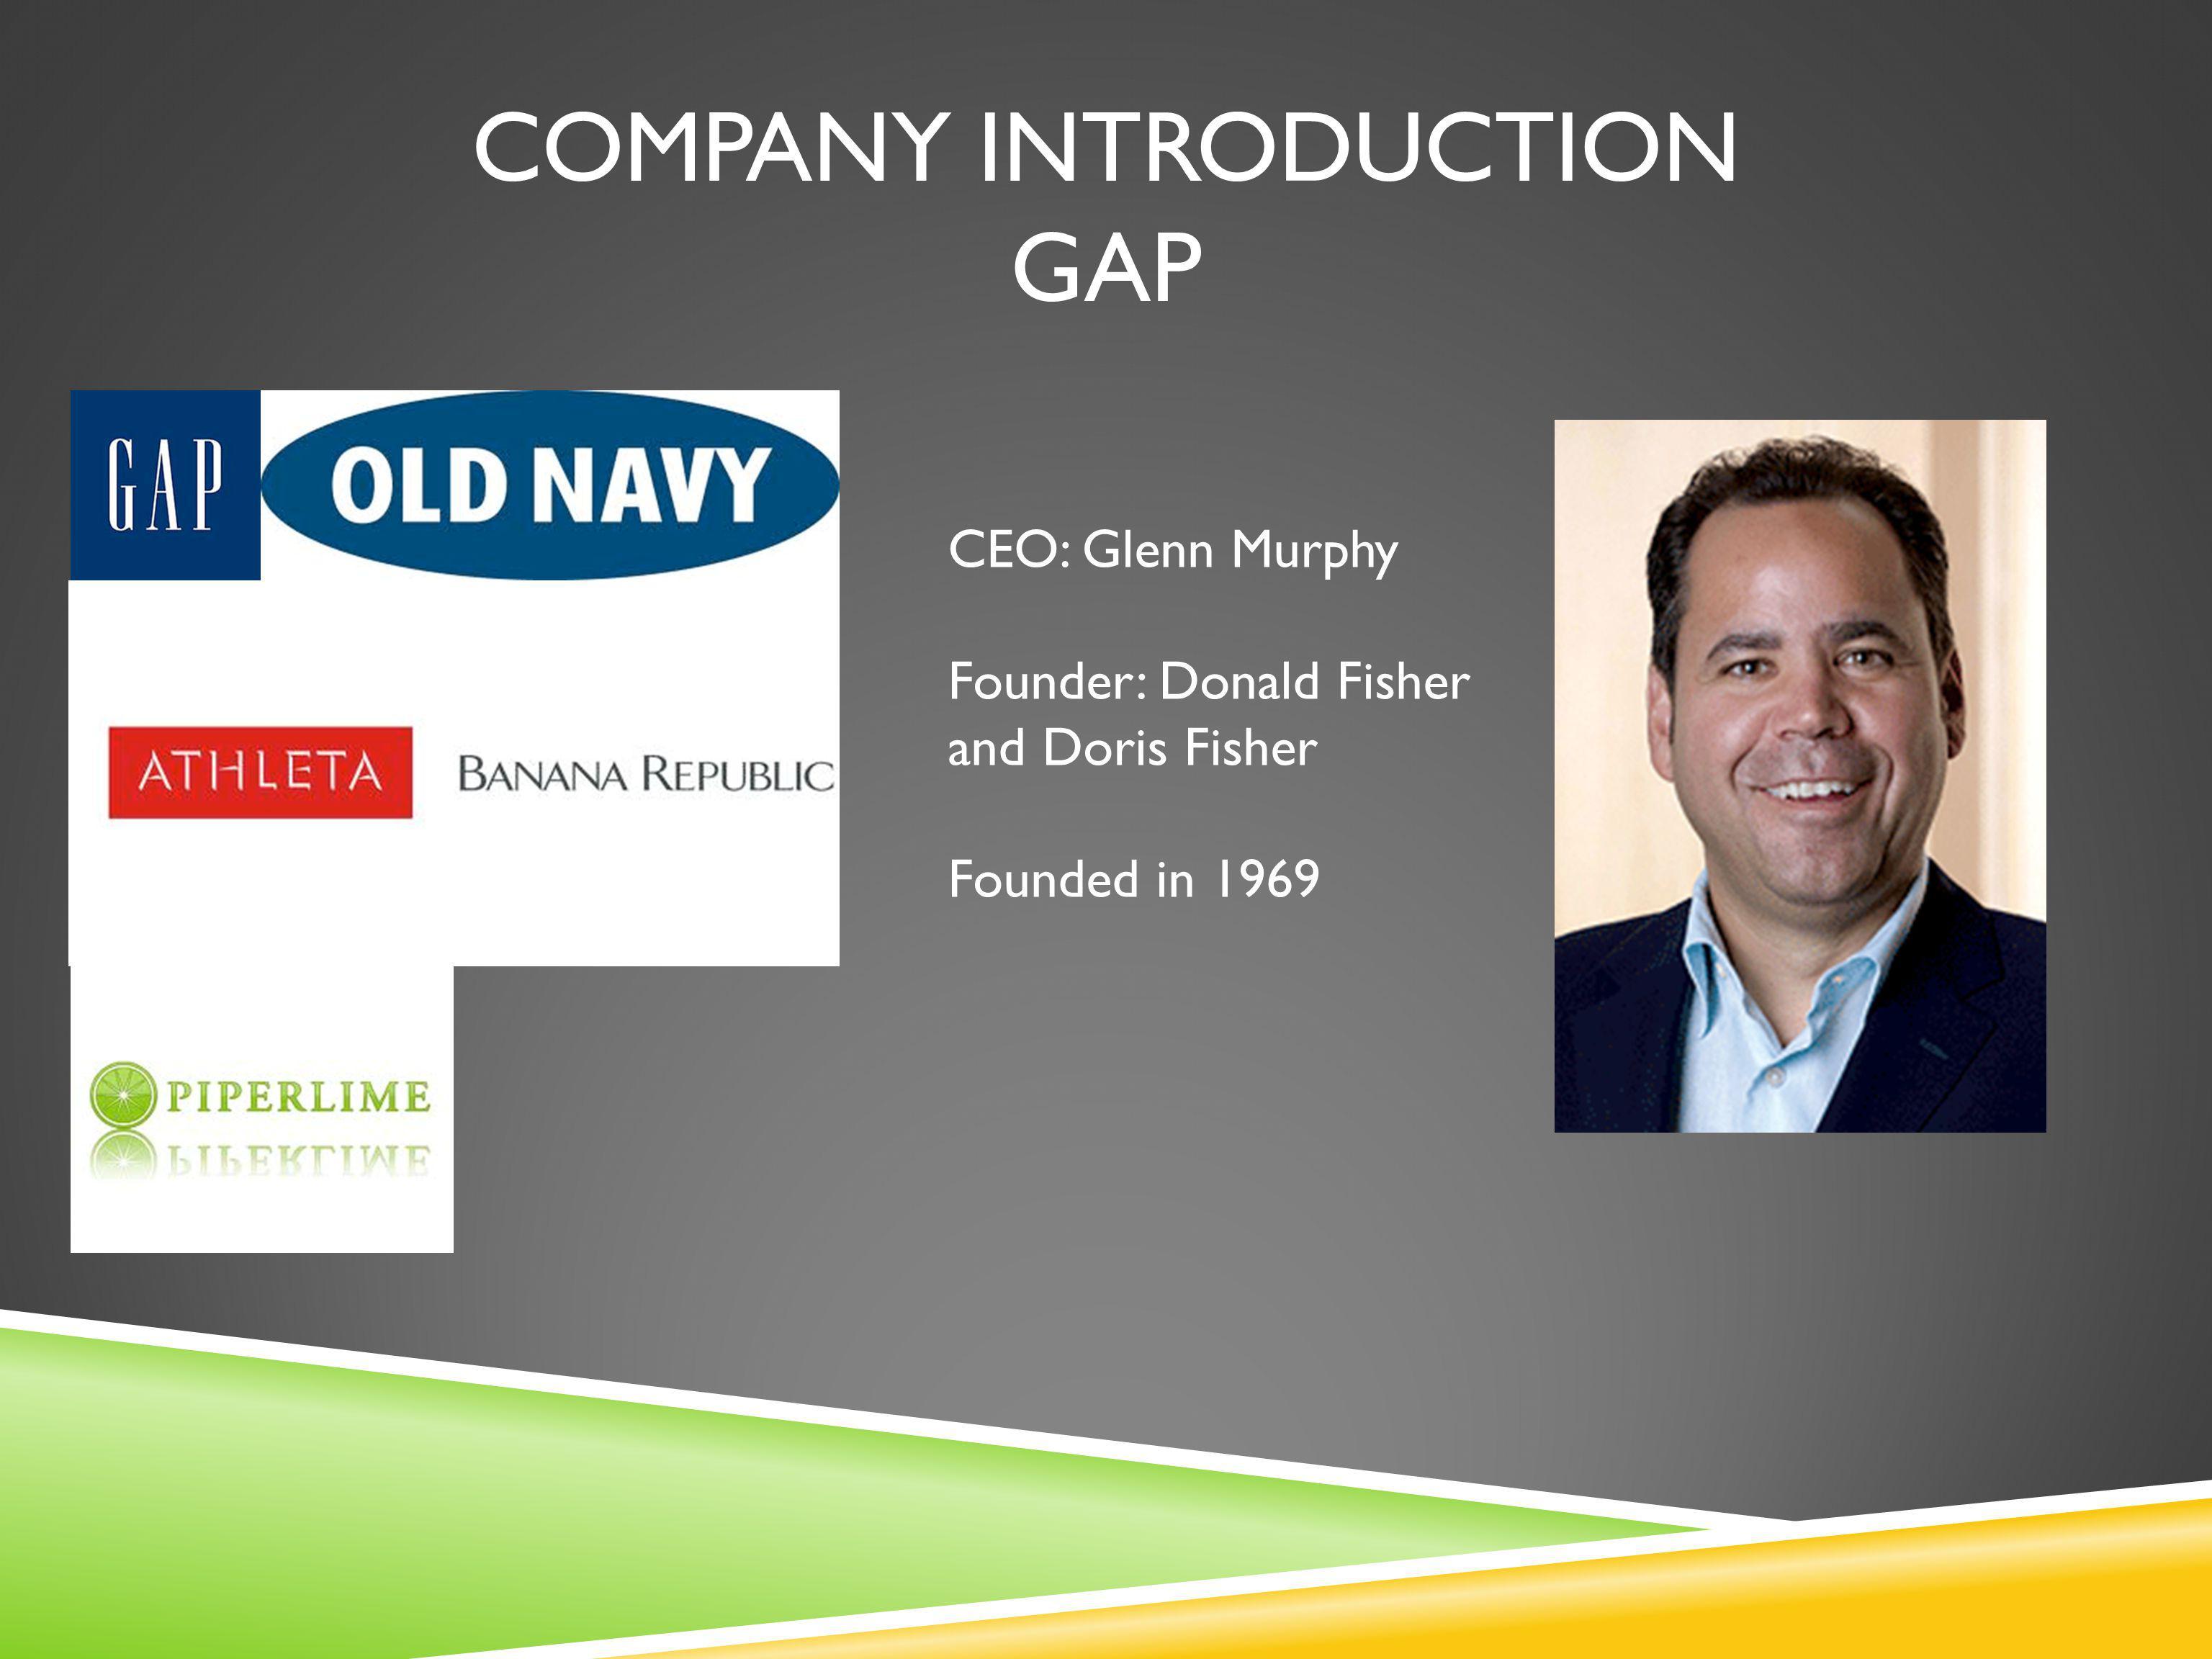 Company introduction gap